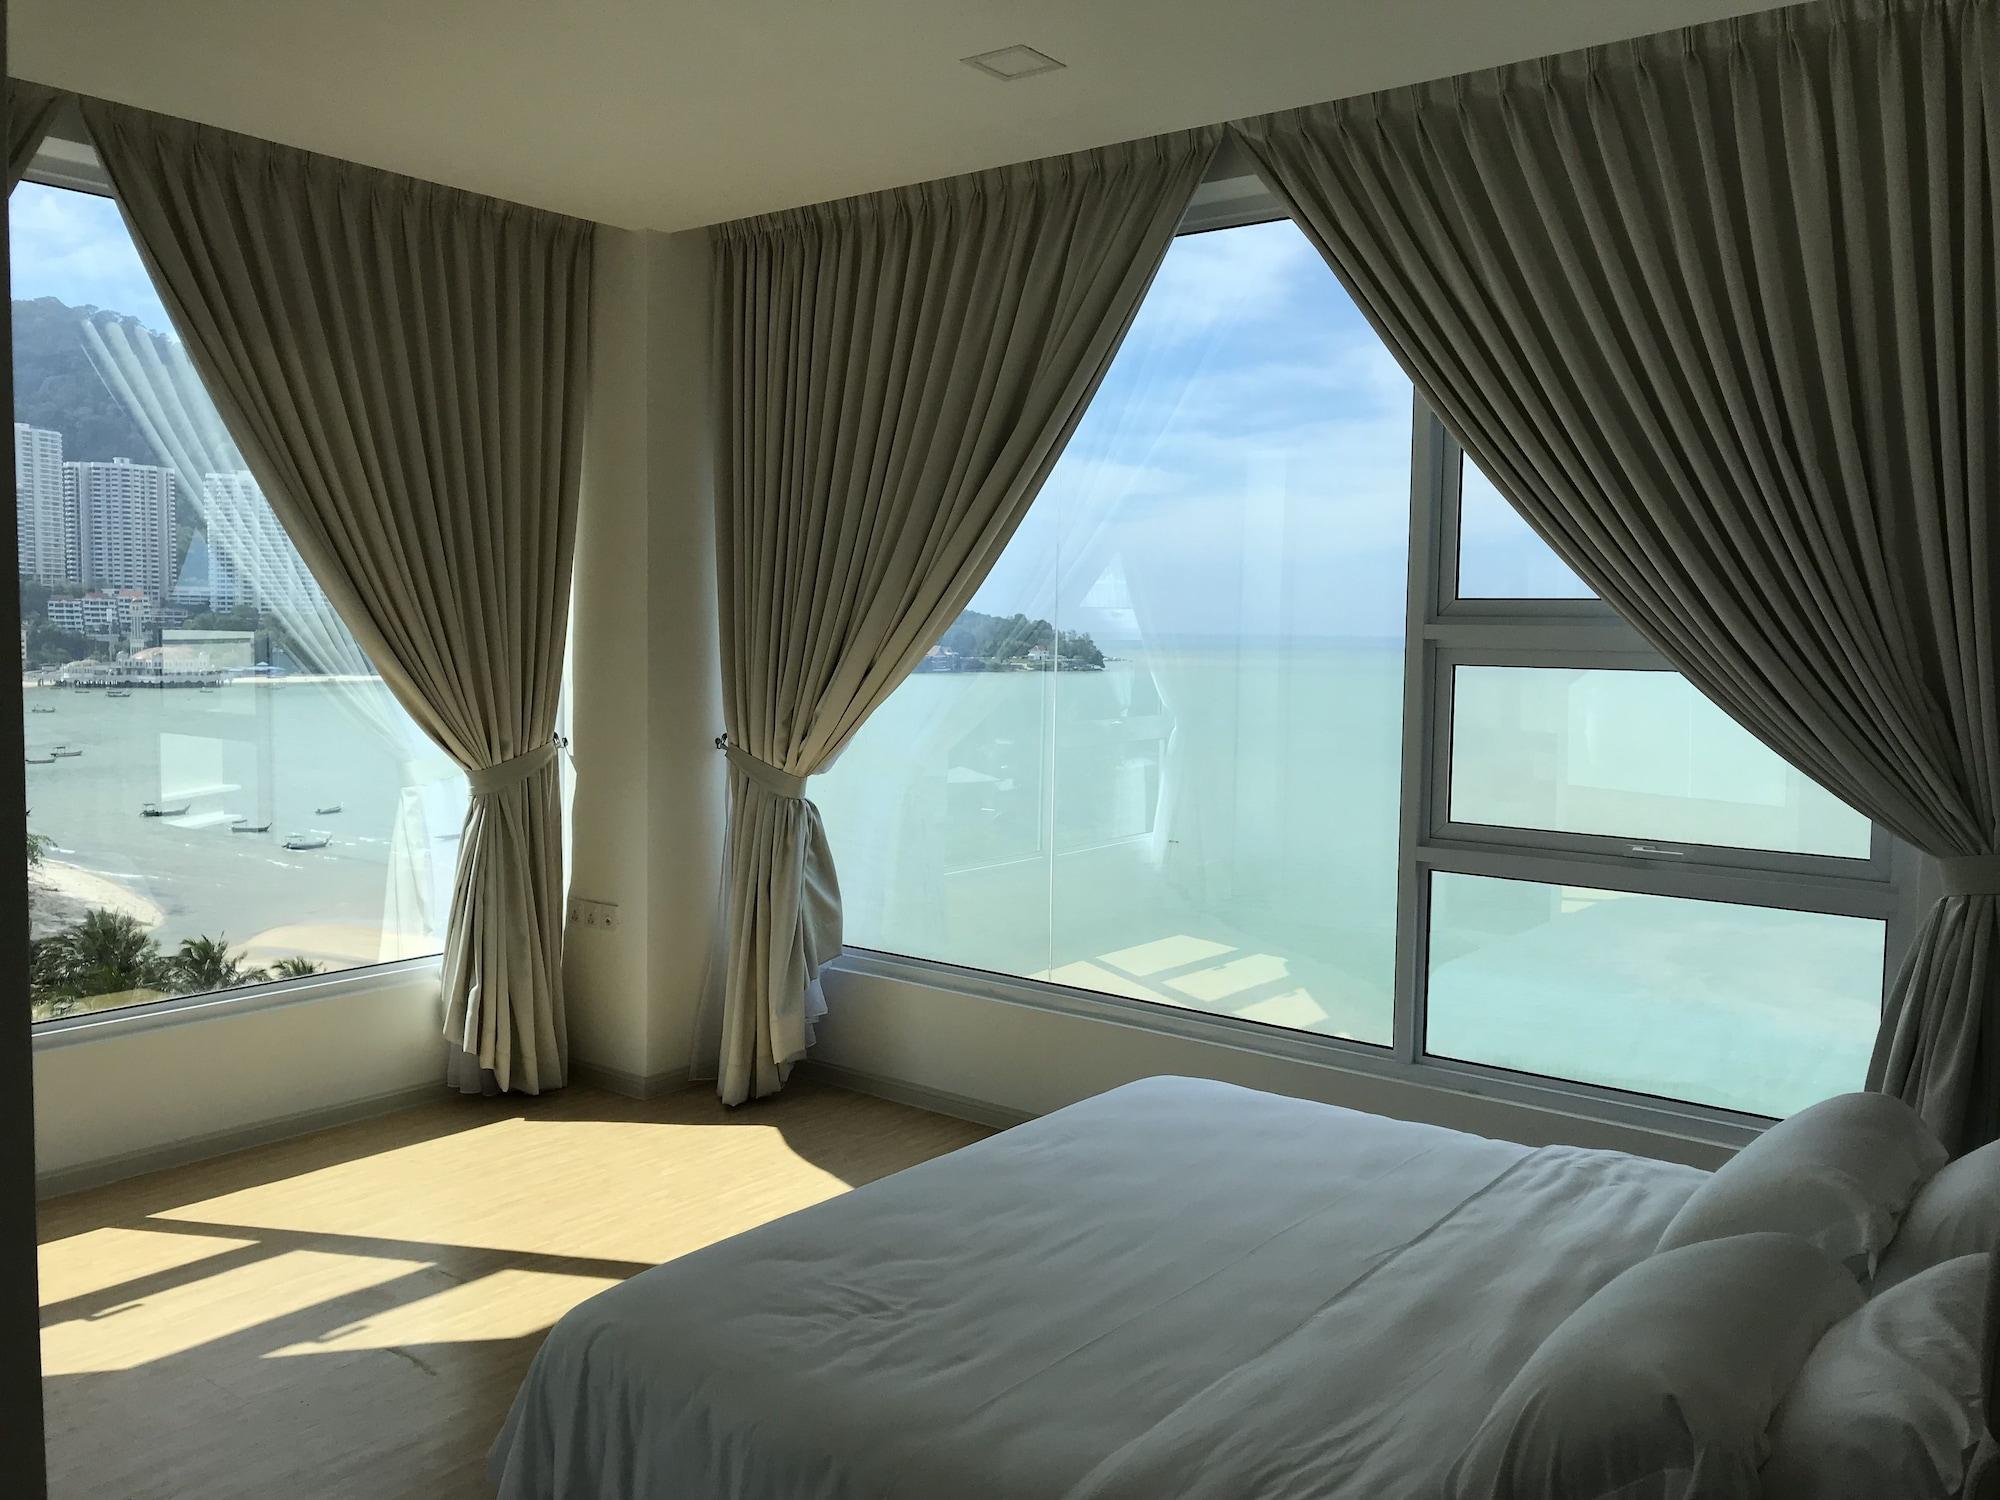 Brand New By The Beach - Tanjung Bungah, Pulau Penang